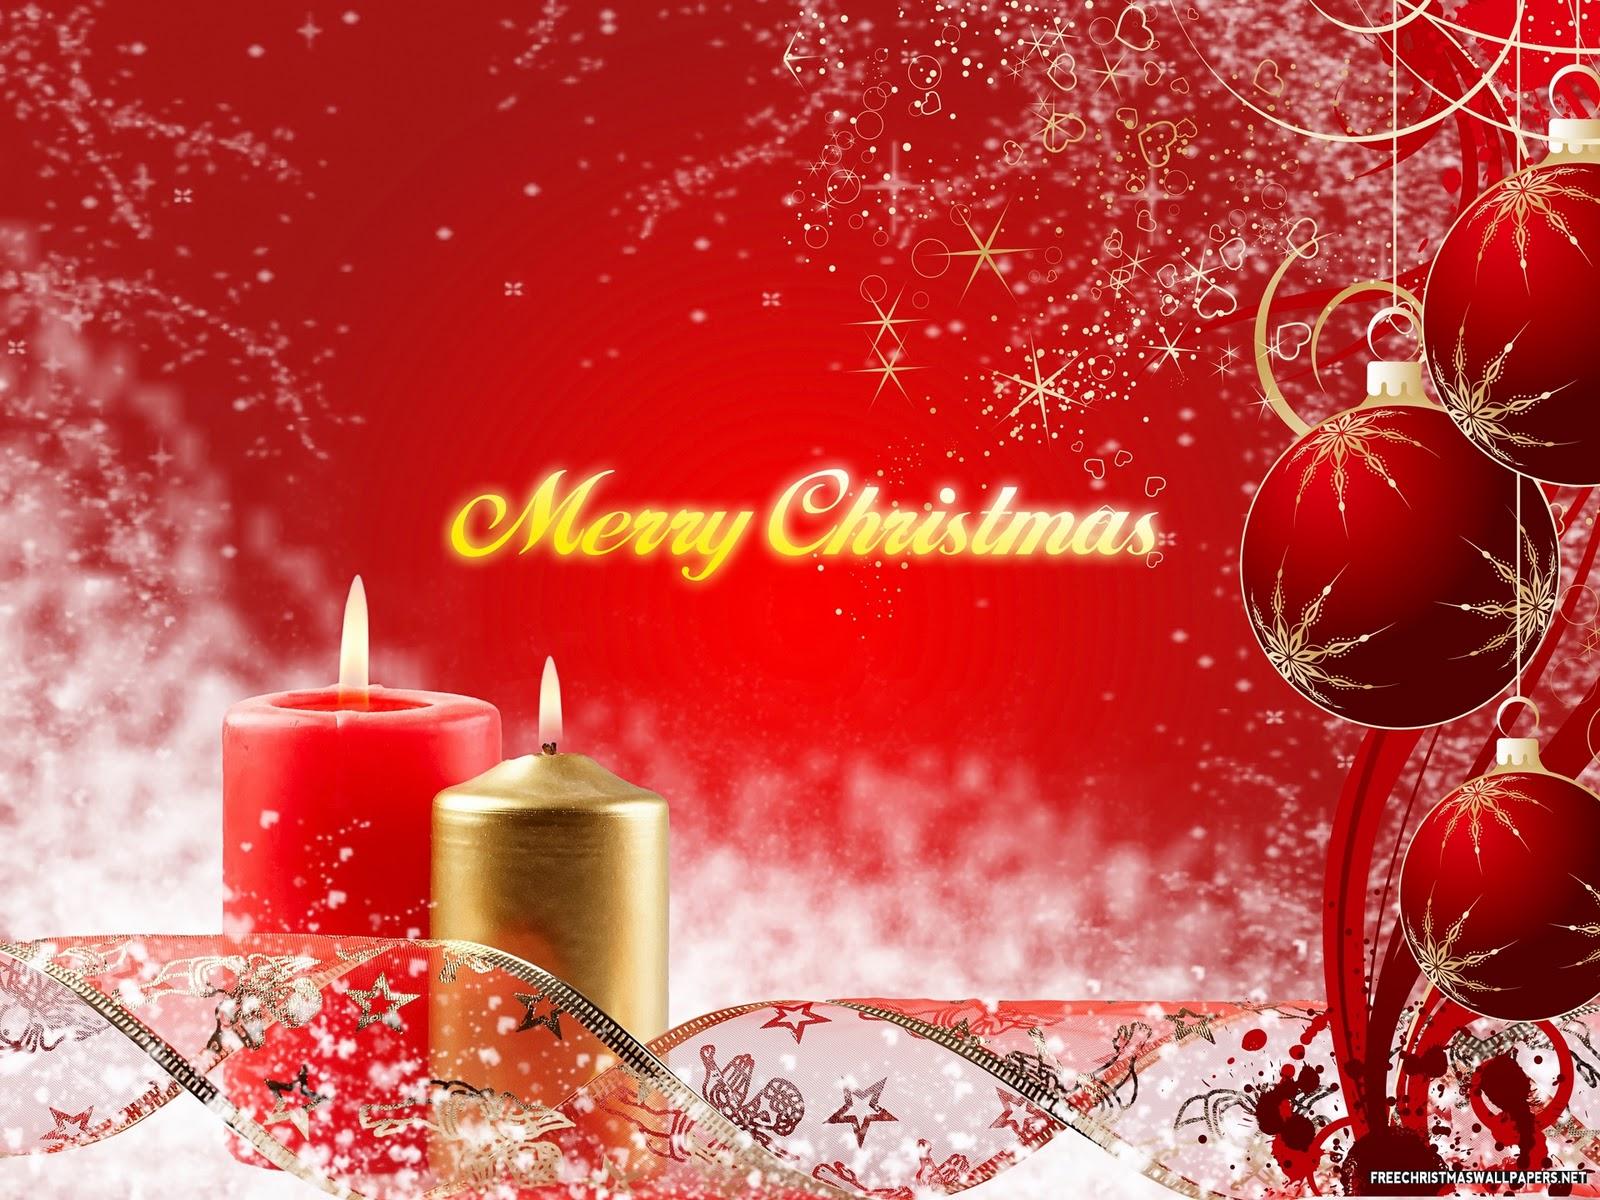 irbob sevenfold: merry christmas greeting wallpaper